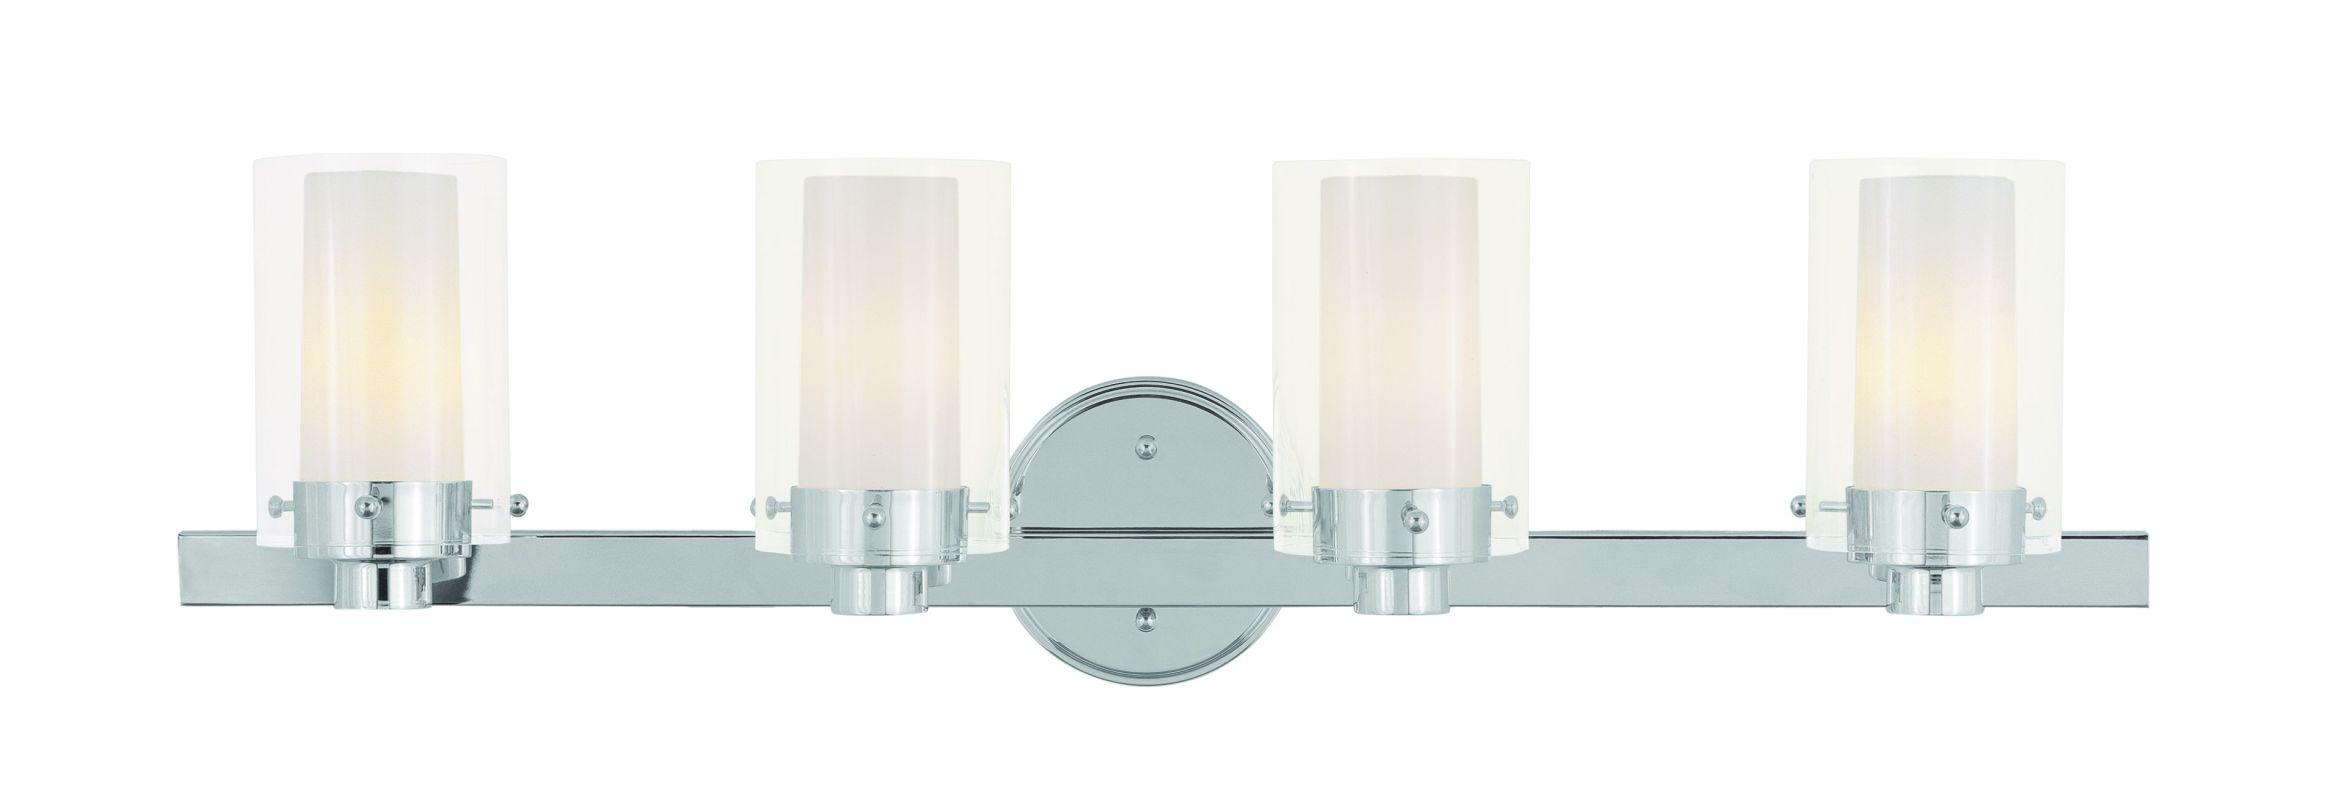 Livex Lighting 1544 Manhattan 4 Light Bathroom Vanity Light Chrome